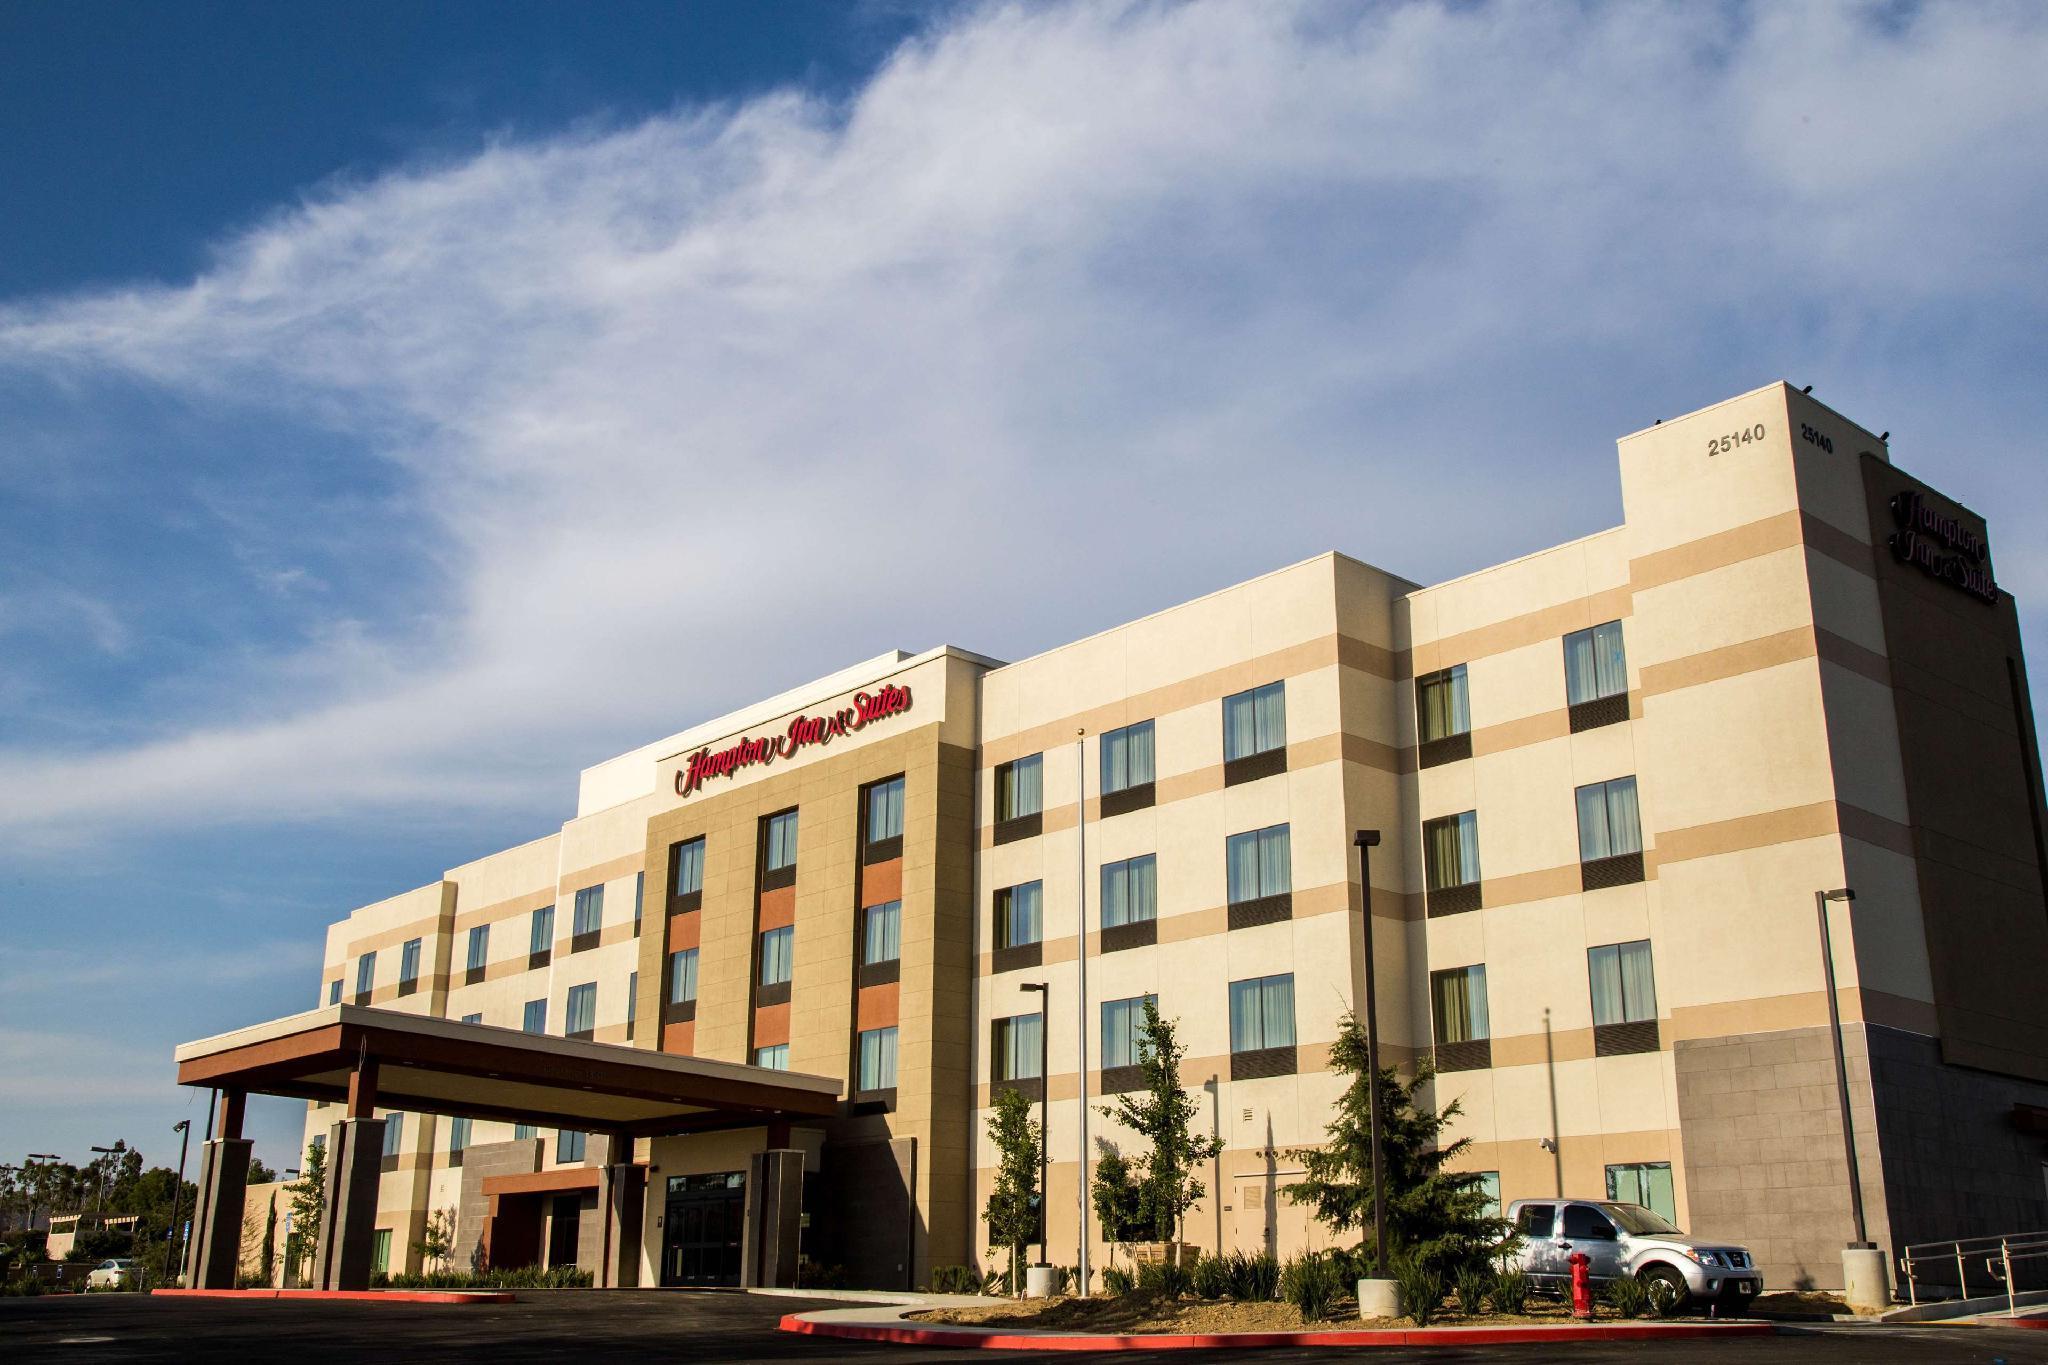 Hampton Inn And Suites Murrieta